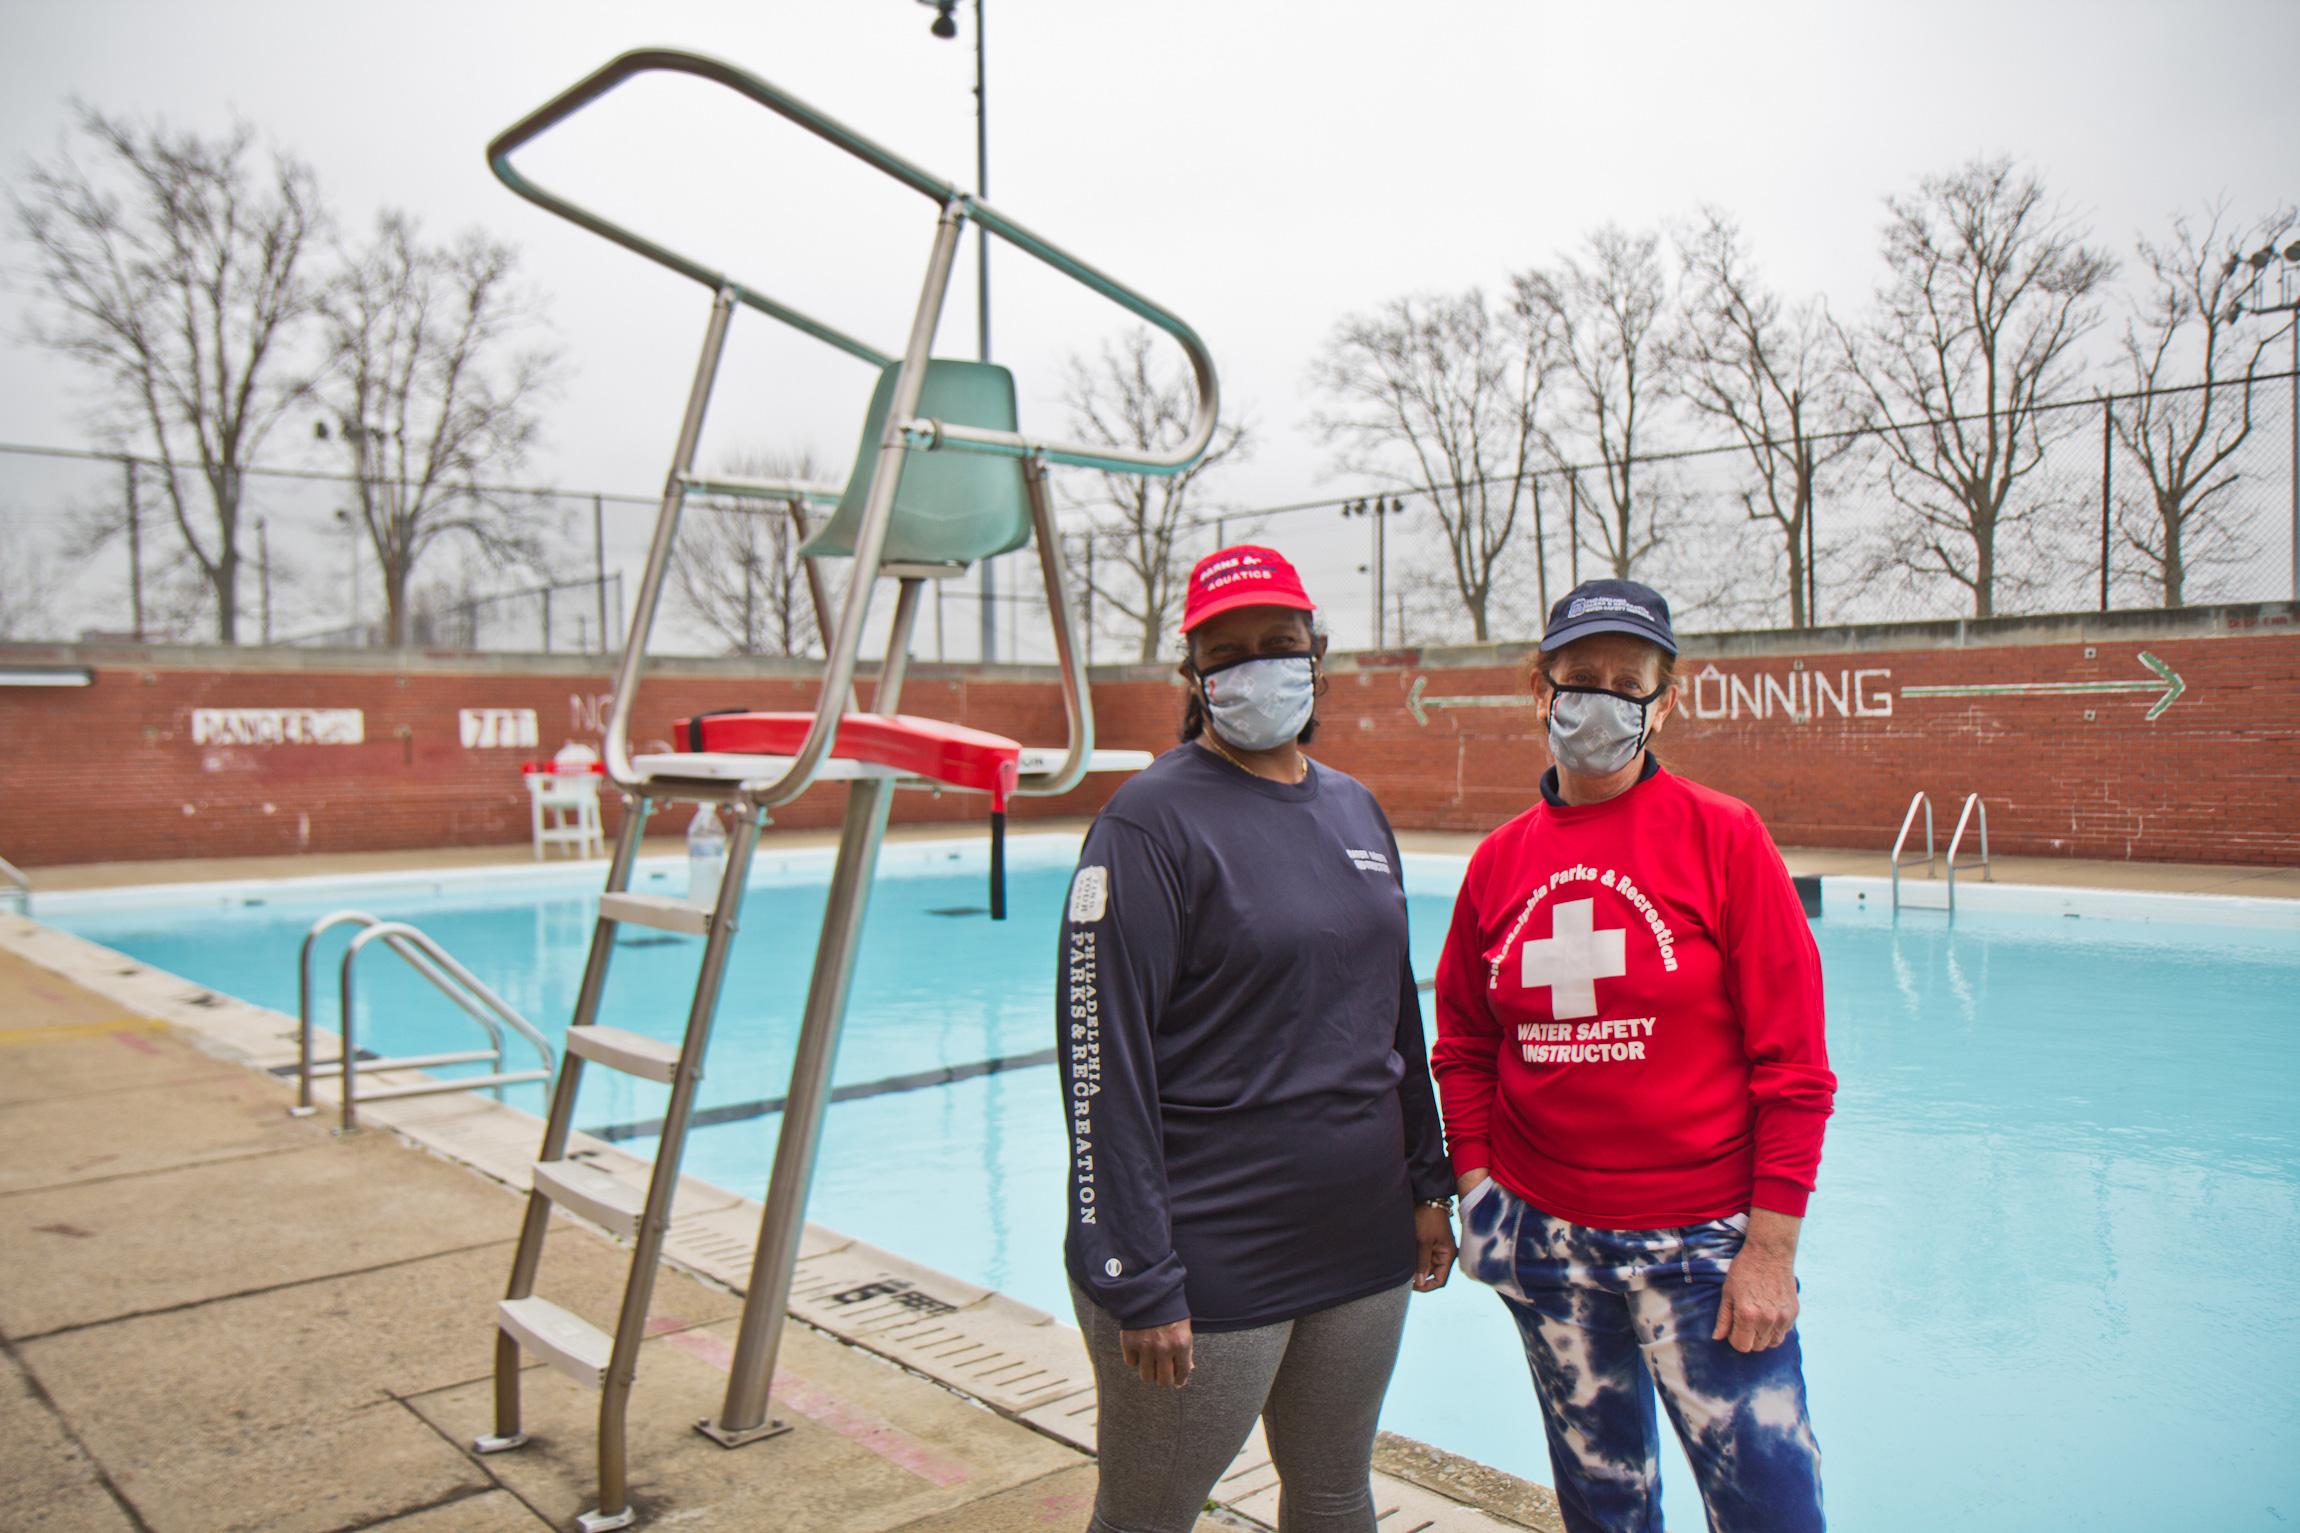 Thelma Nesbitt (left) and Margaret Fredlund stand beside a pool